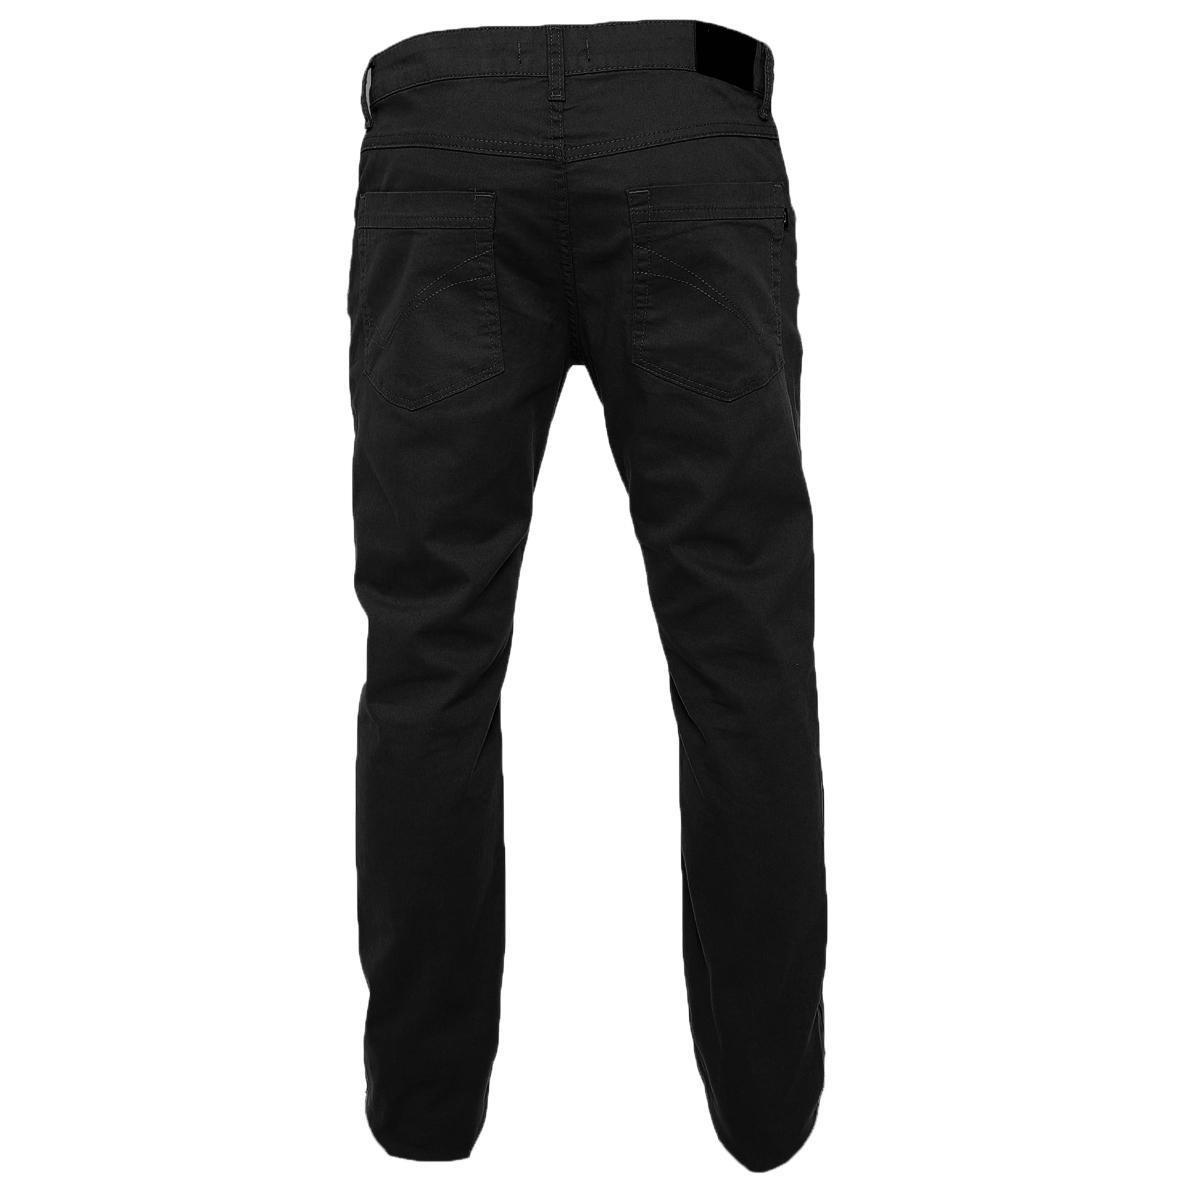 729be091a68a8 Calça Jeans Oakley 5 pockets Regular Fit - Preto - Compre Agora ...